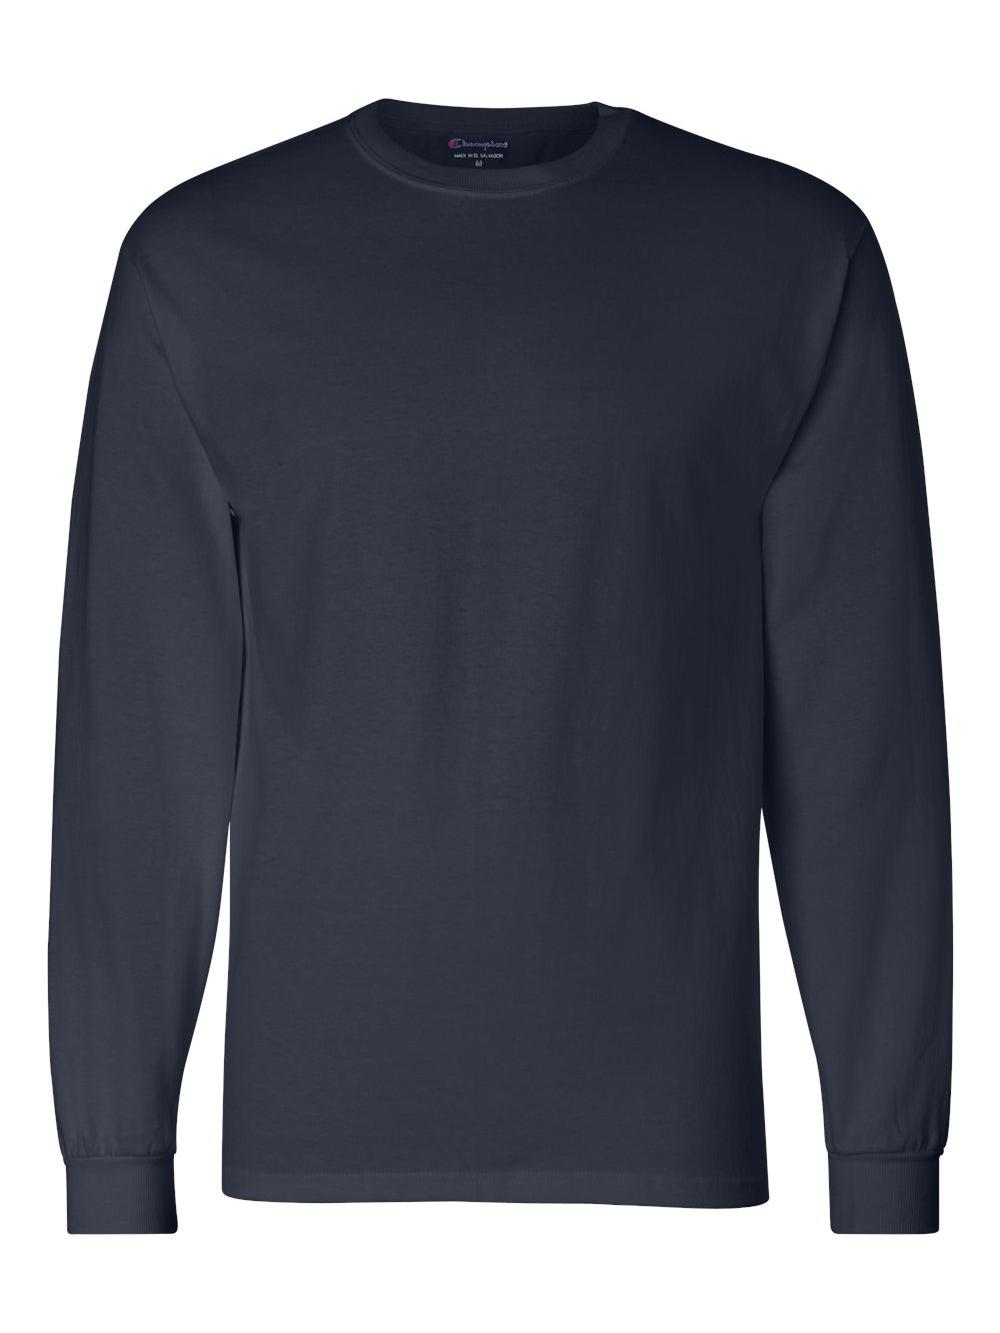 Champion-Long-Sleeve-T-Shirt-CC8C thumbnail 9